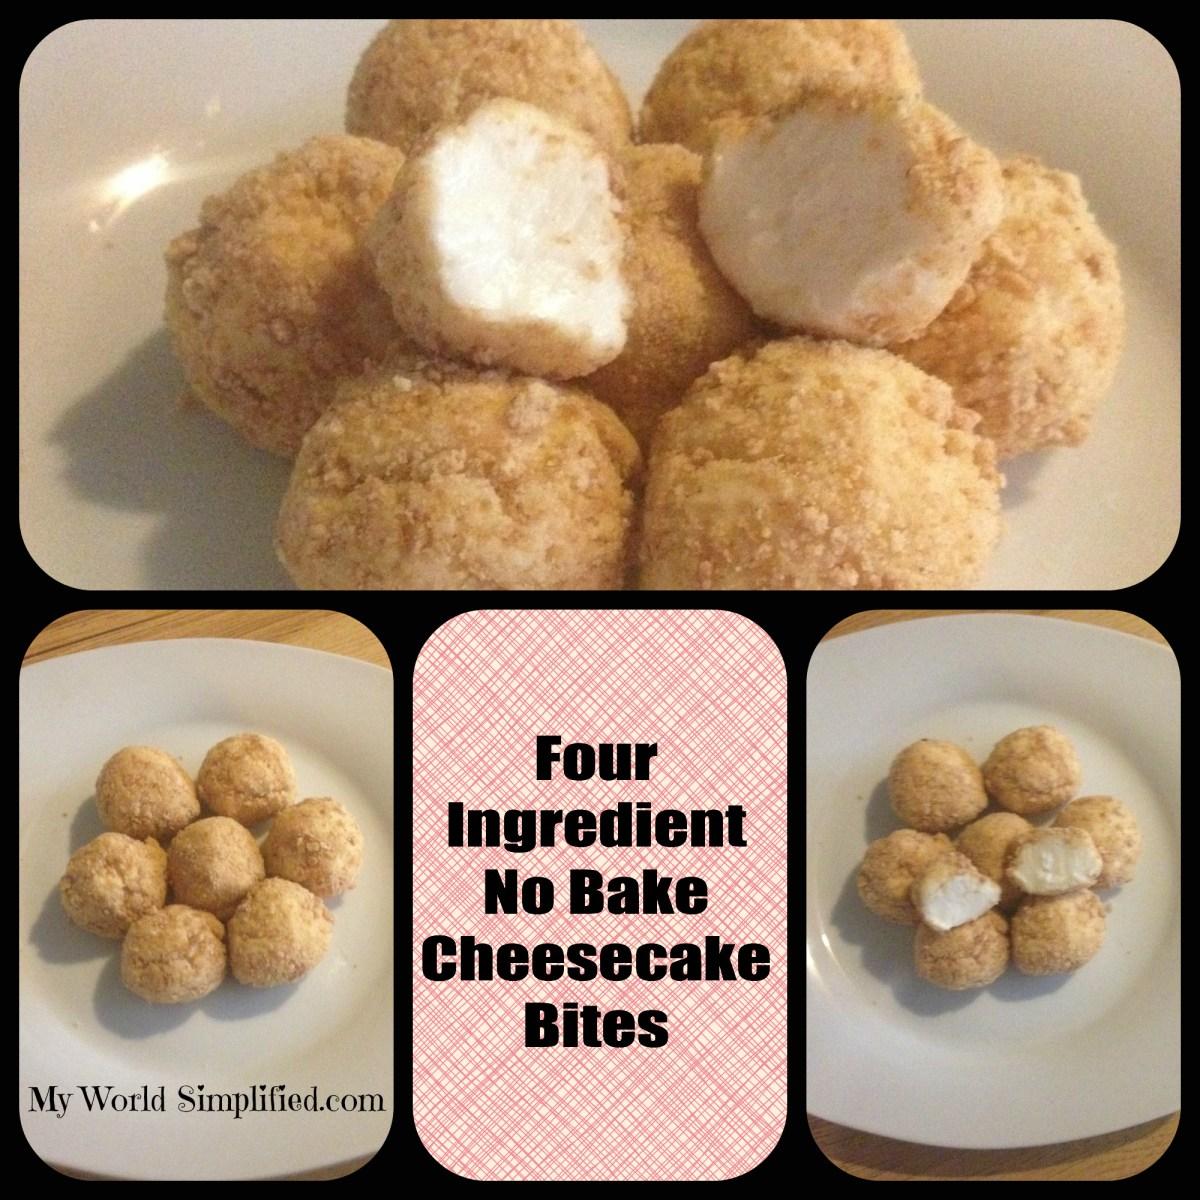 No Bake Cheesecake Bites Recipe - myworldsimplified.com